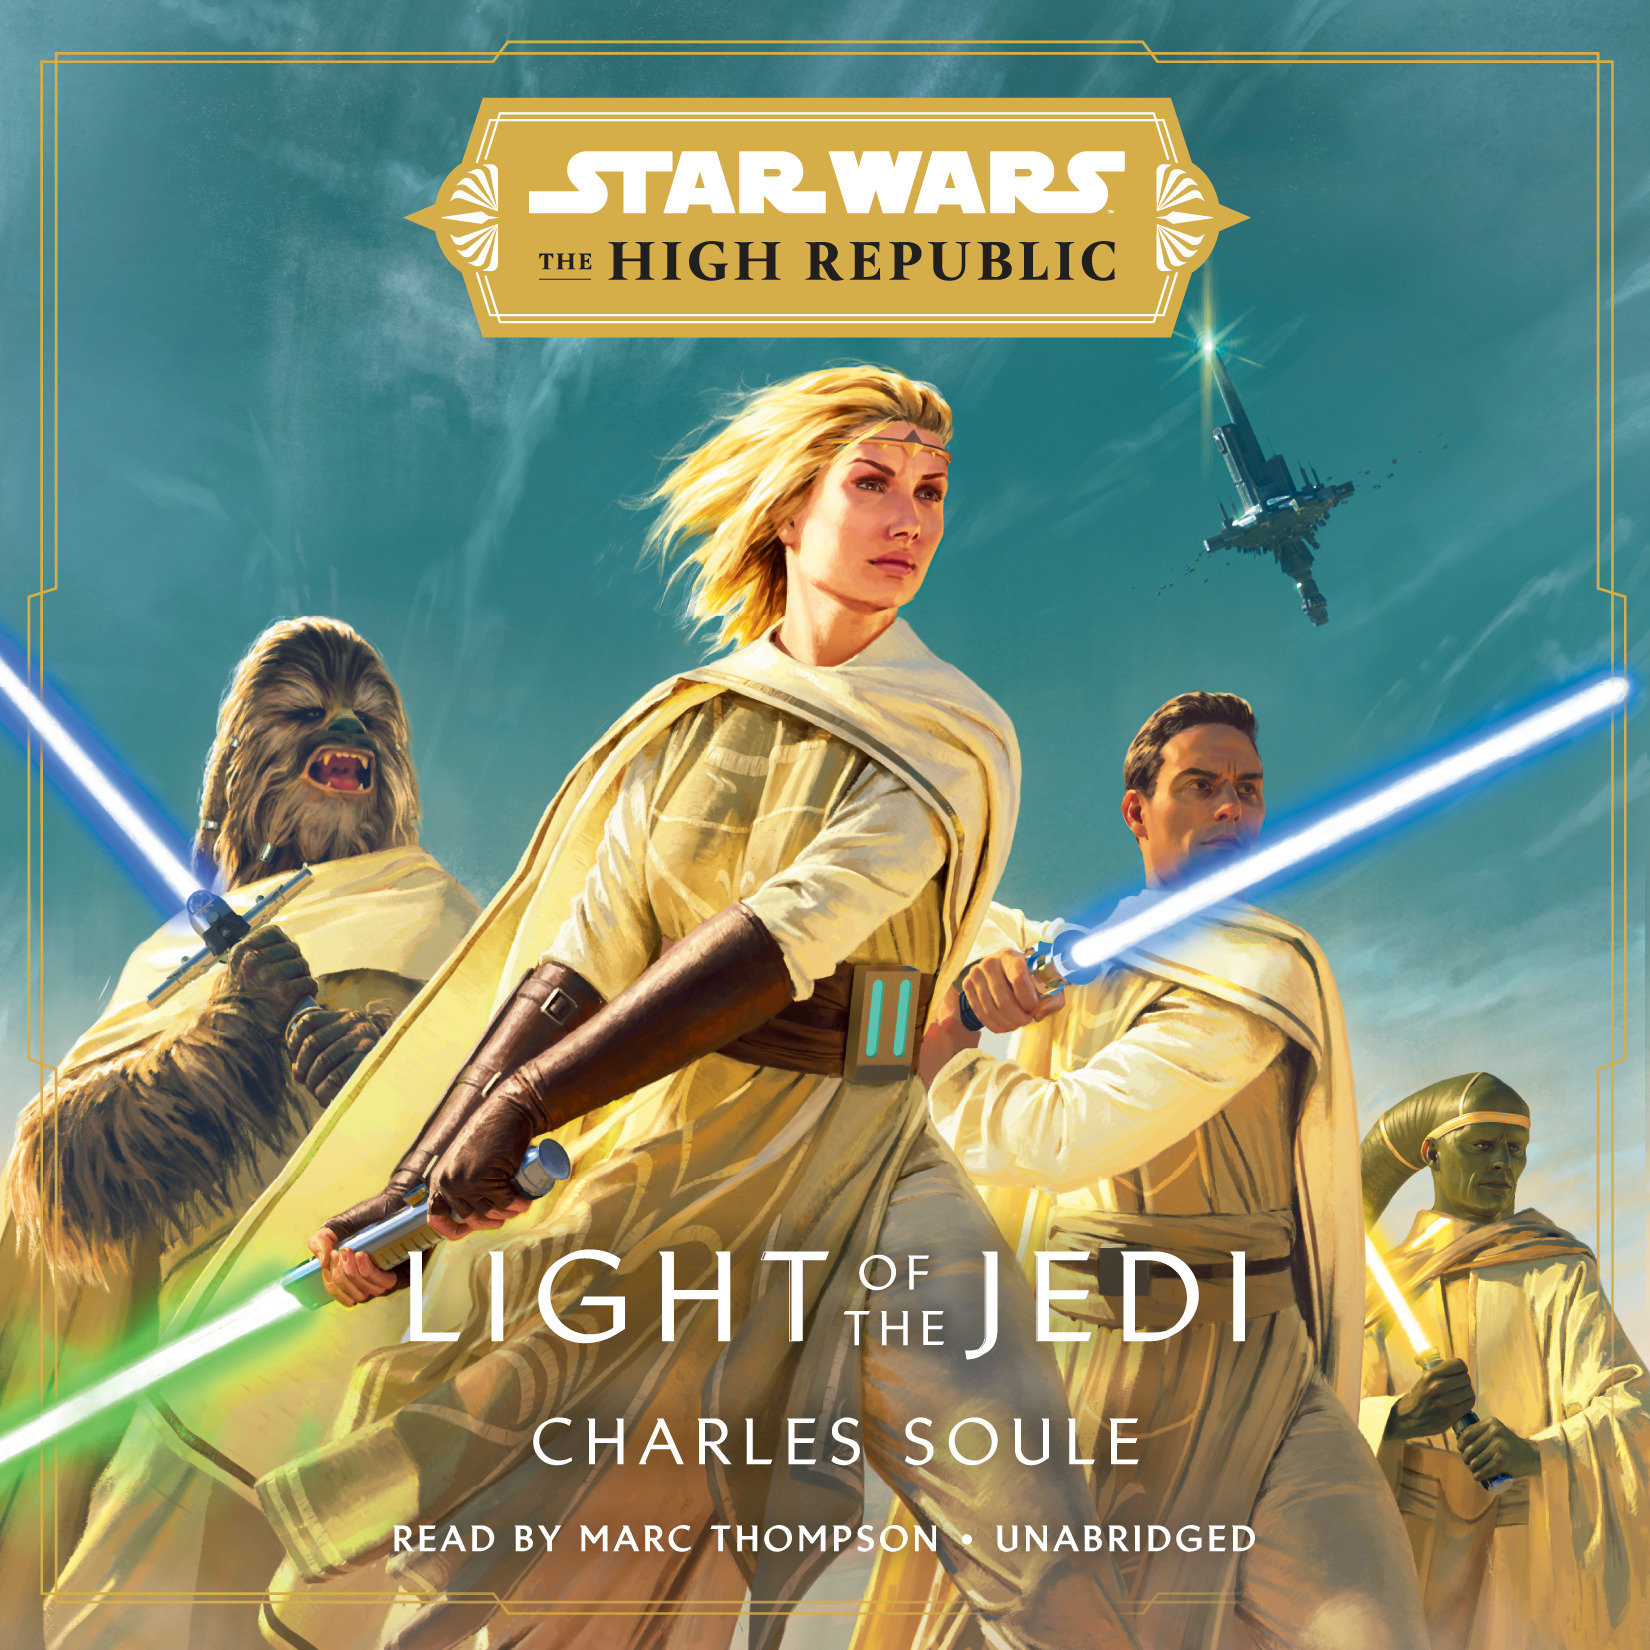 The High Republic: Light of the Jedi (25.08.2020)